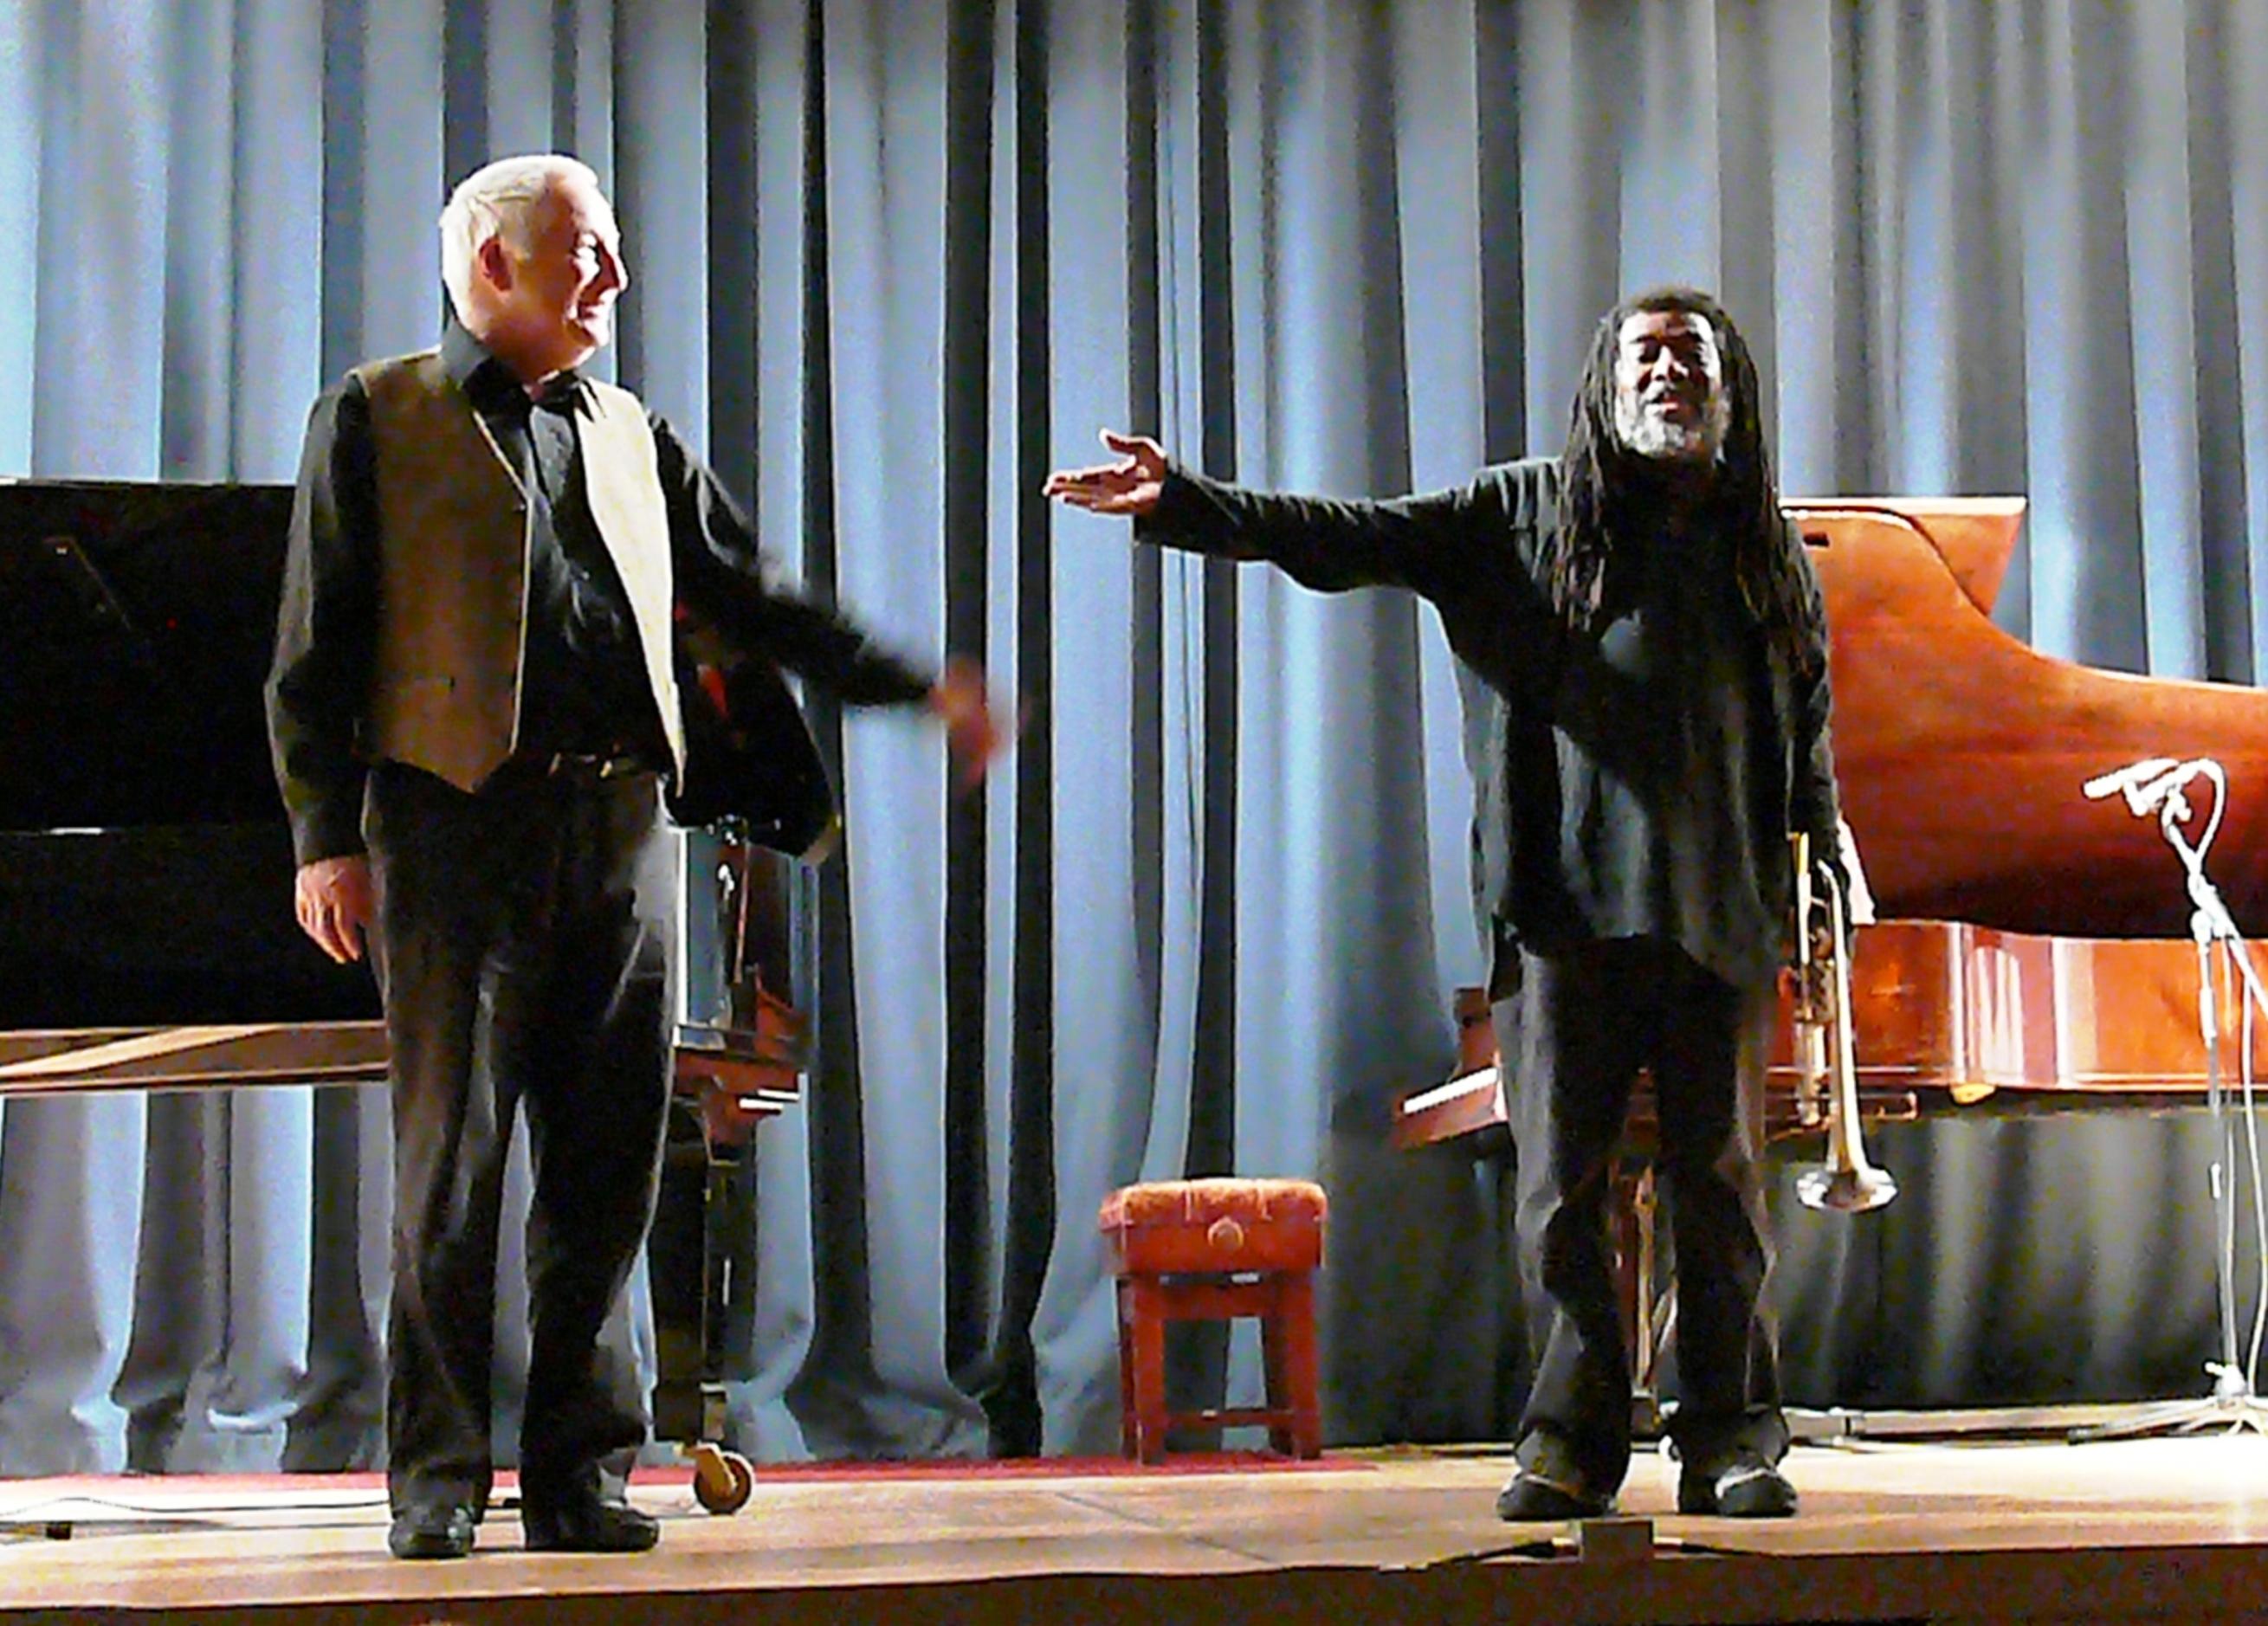 John Tilbury and Wadada Leo Smith at the Bishopsgate Institute, London in November 2012